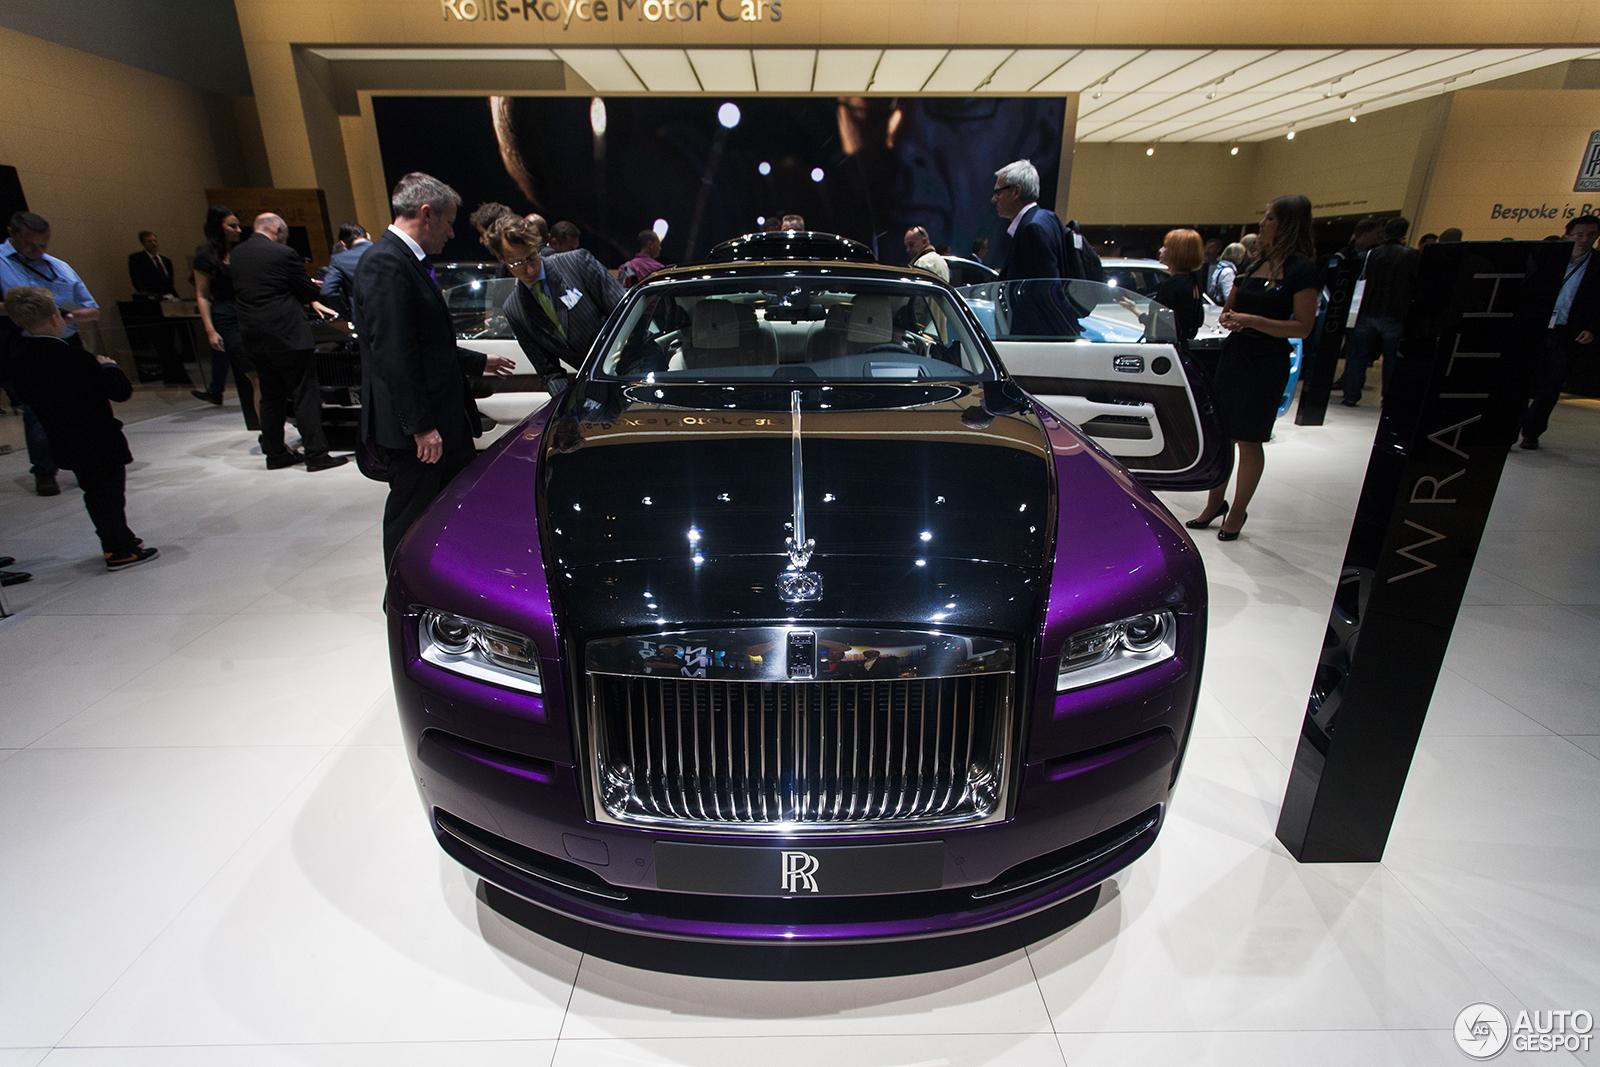 IAA 2013: Rolls-Royce Ghost Alpine Trial & Bespoke Wraith